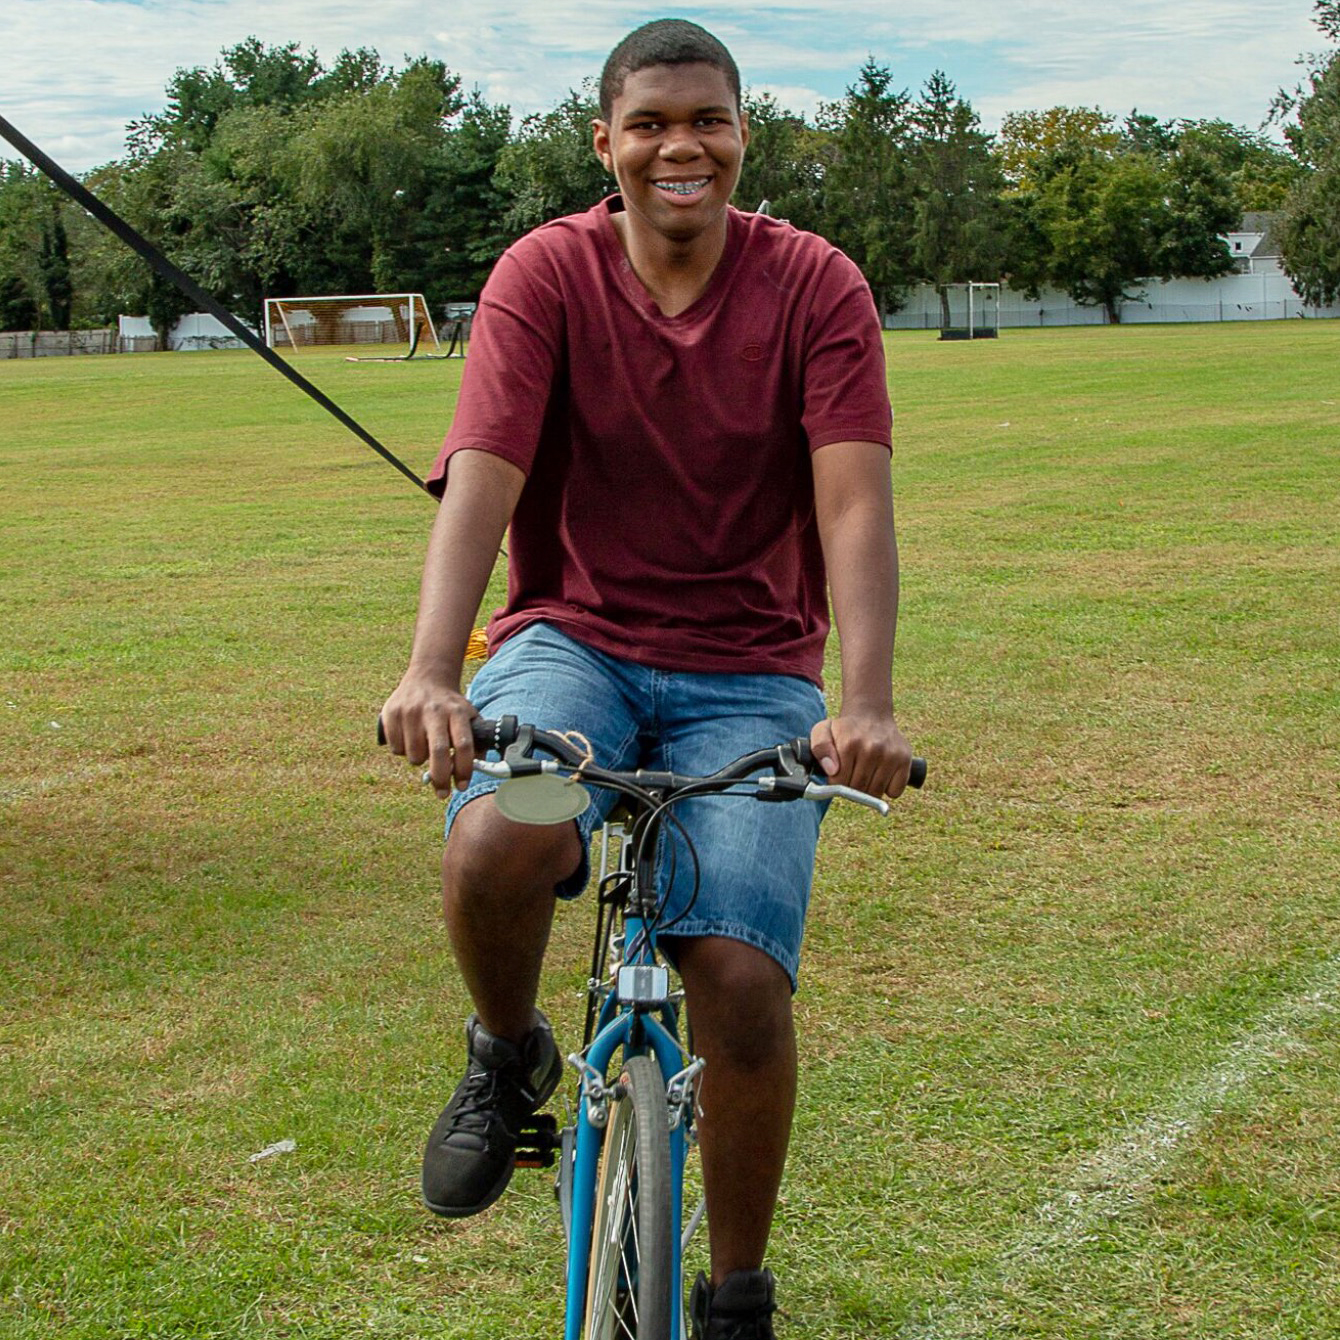 Boy on bike.jpeg